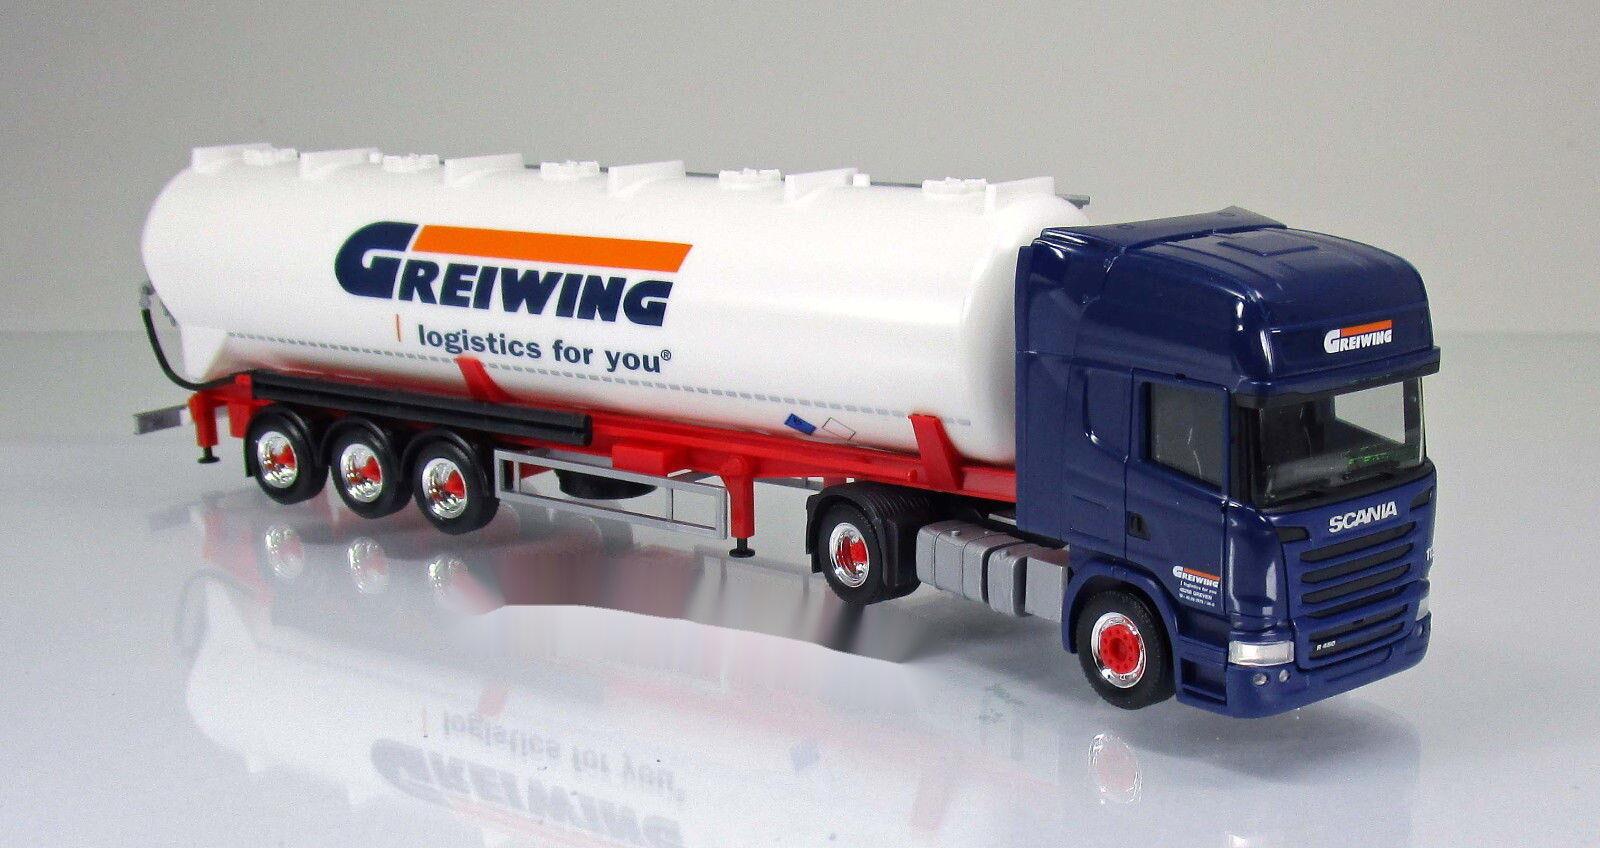 Herpa 306195 Scania R TL CDR Silo Semi-remorque camion GREIWING Scale 1 87 Nouveau neuf dans sa boîte